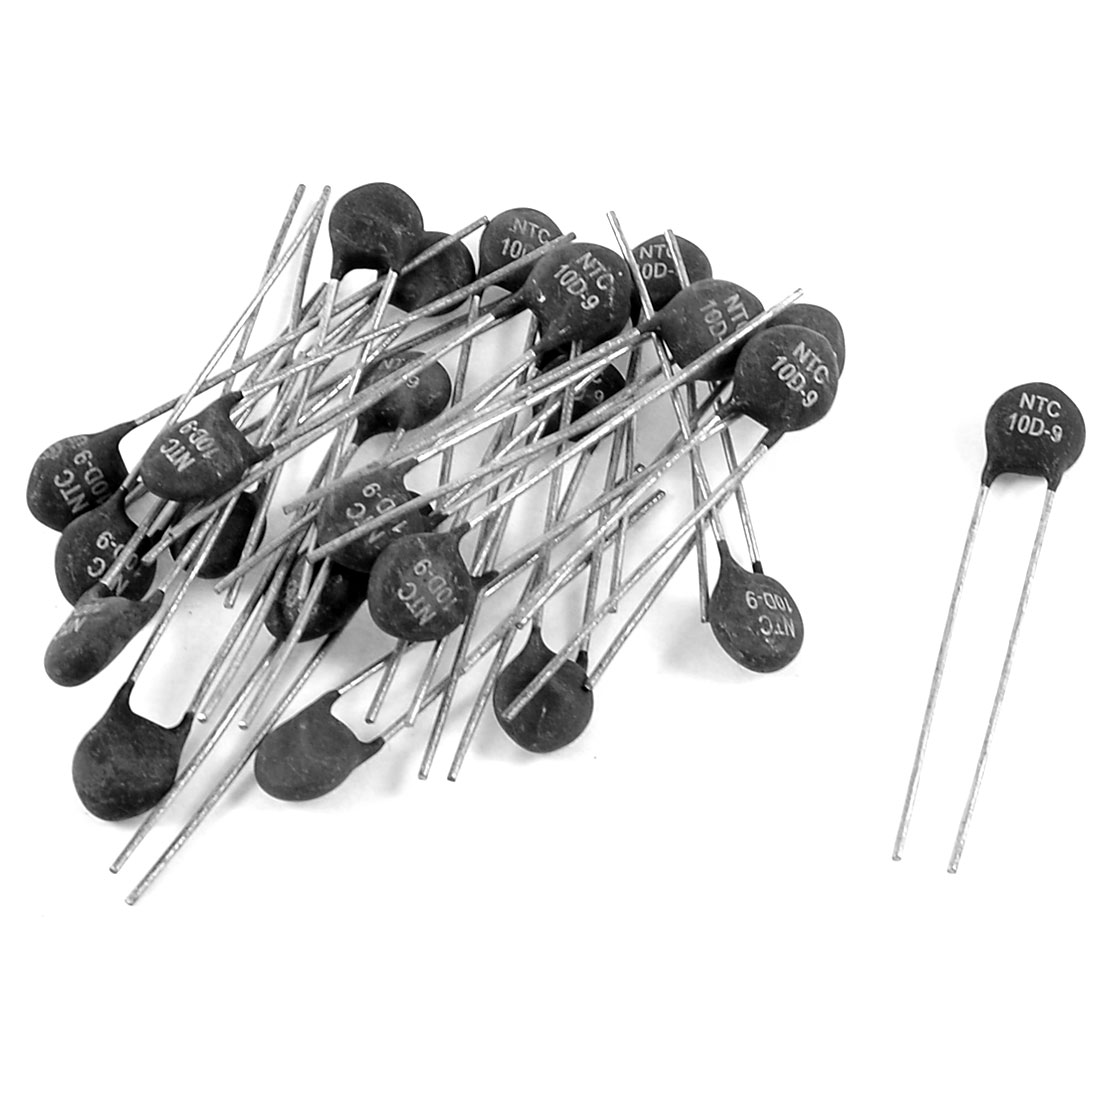 "4.5mm Pitch NTC Thermistors 1.8"" Long Black Silver Tone 9 Ohm 25 Pcs"